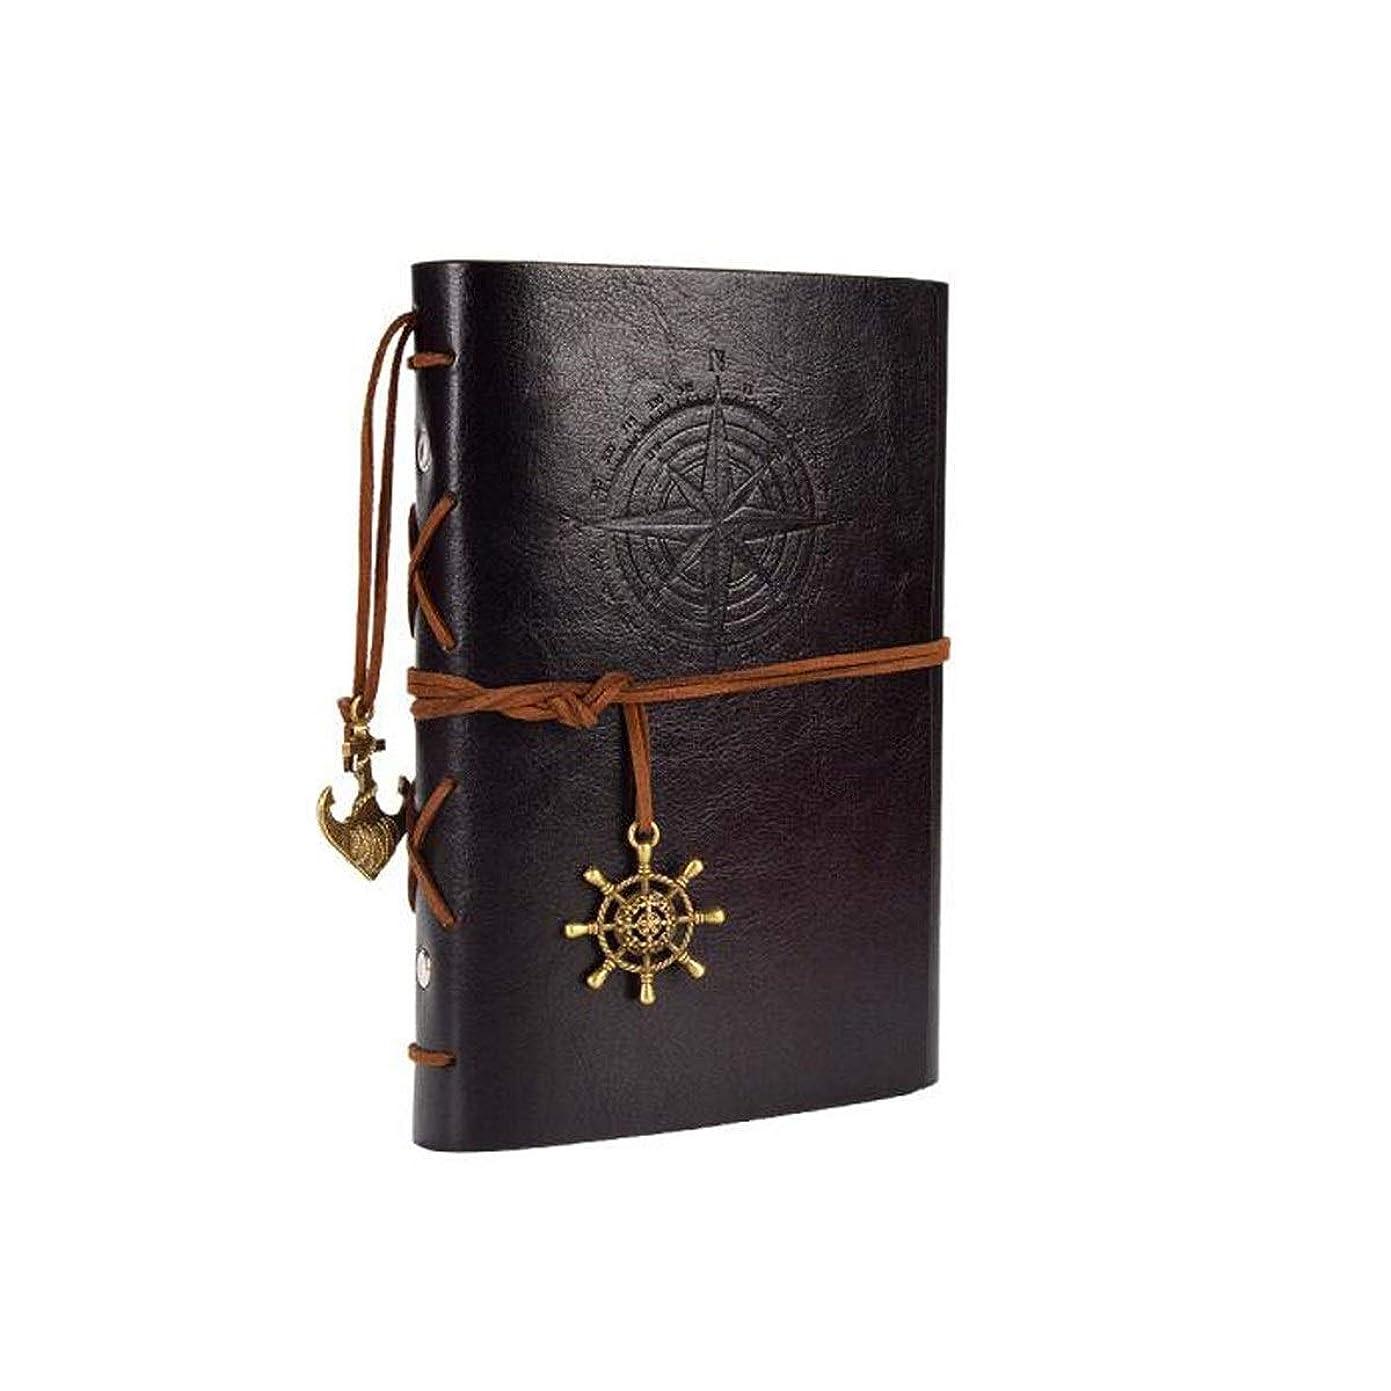 XIONGHAIZI A6ノートの文房具、海賊のレトロな本、旅行日記、クリエイティブDIYルーズリーフノート、黒、赤、青、茶色の4つ、空白のインナーコア (Color : Black)